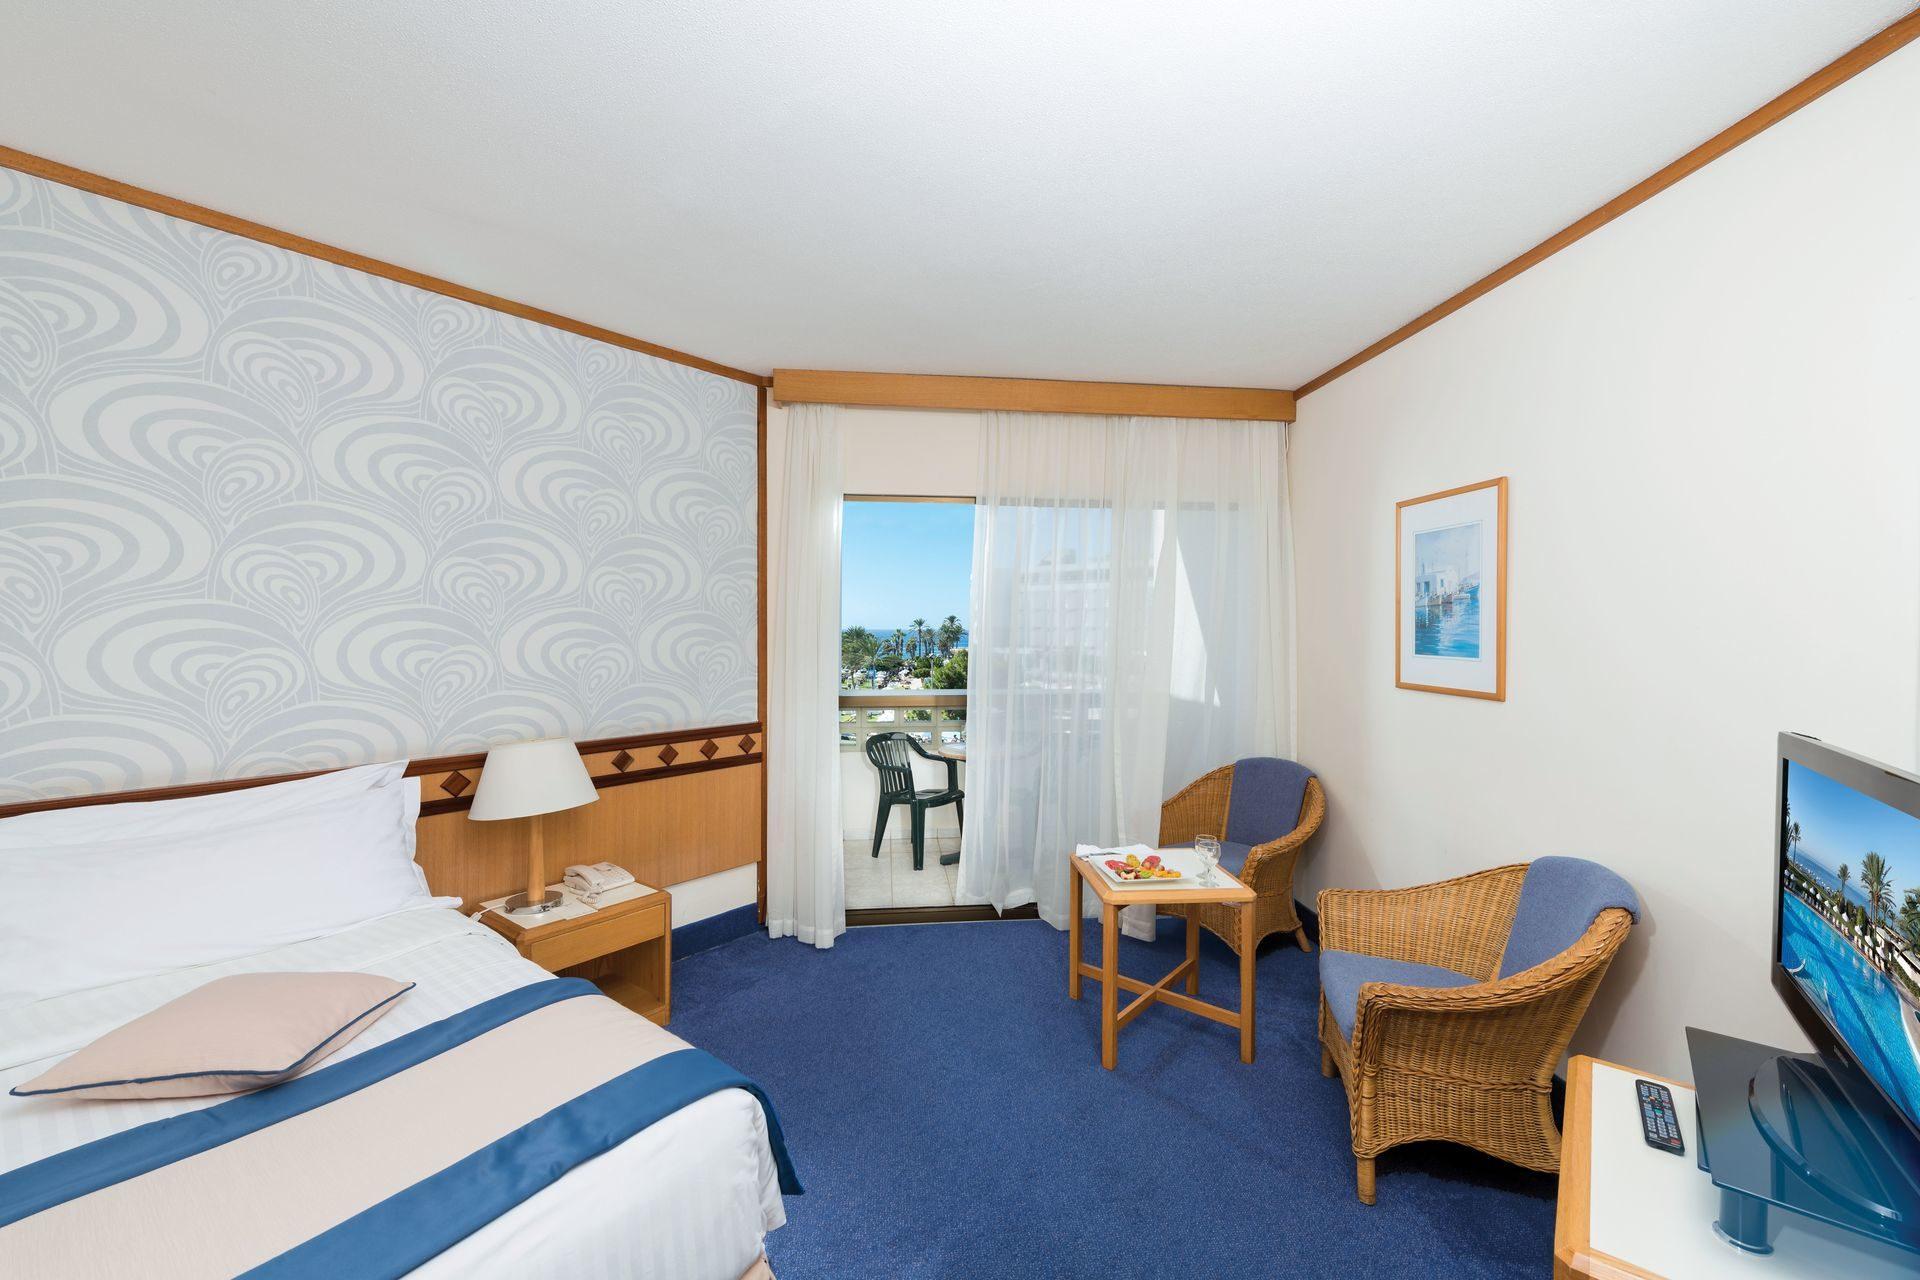 _24 athena beach hotel standard room lsv_resized